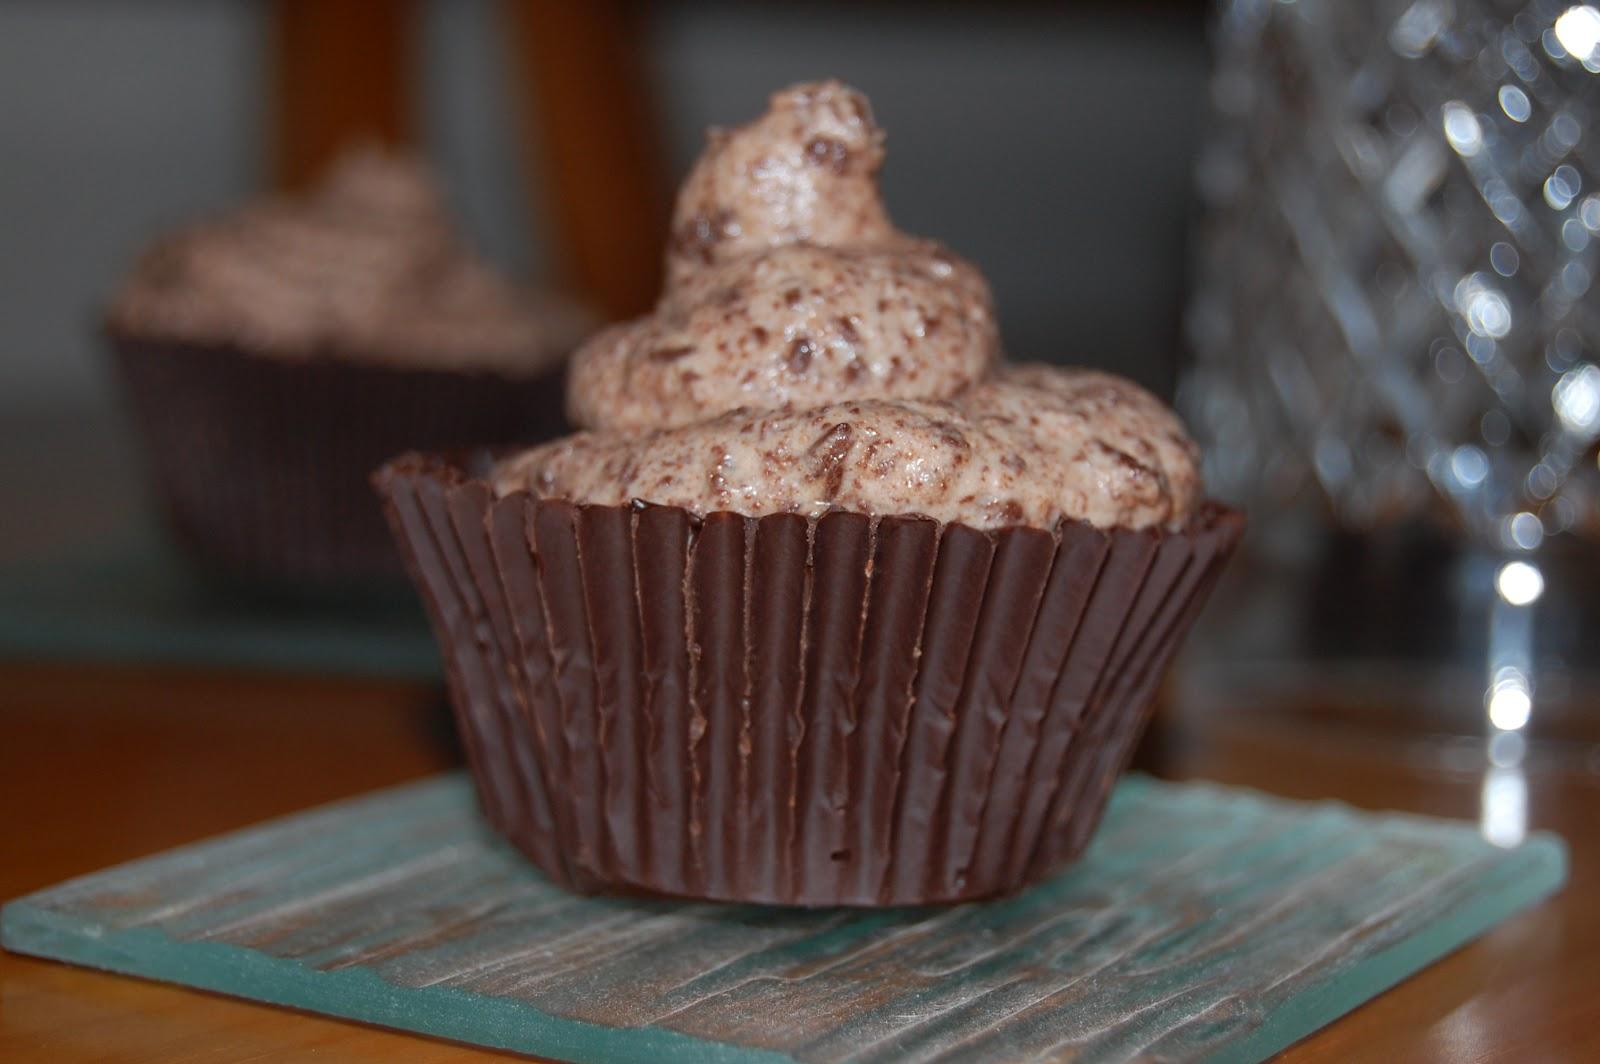 http://azucarenmicocina.blogspot.com.es/2012/06/falsas-cupcakes-de-chocolate.html